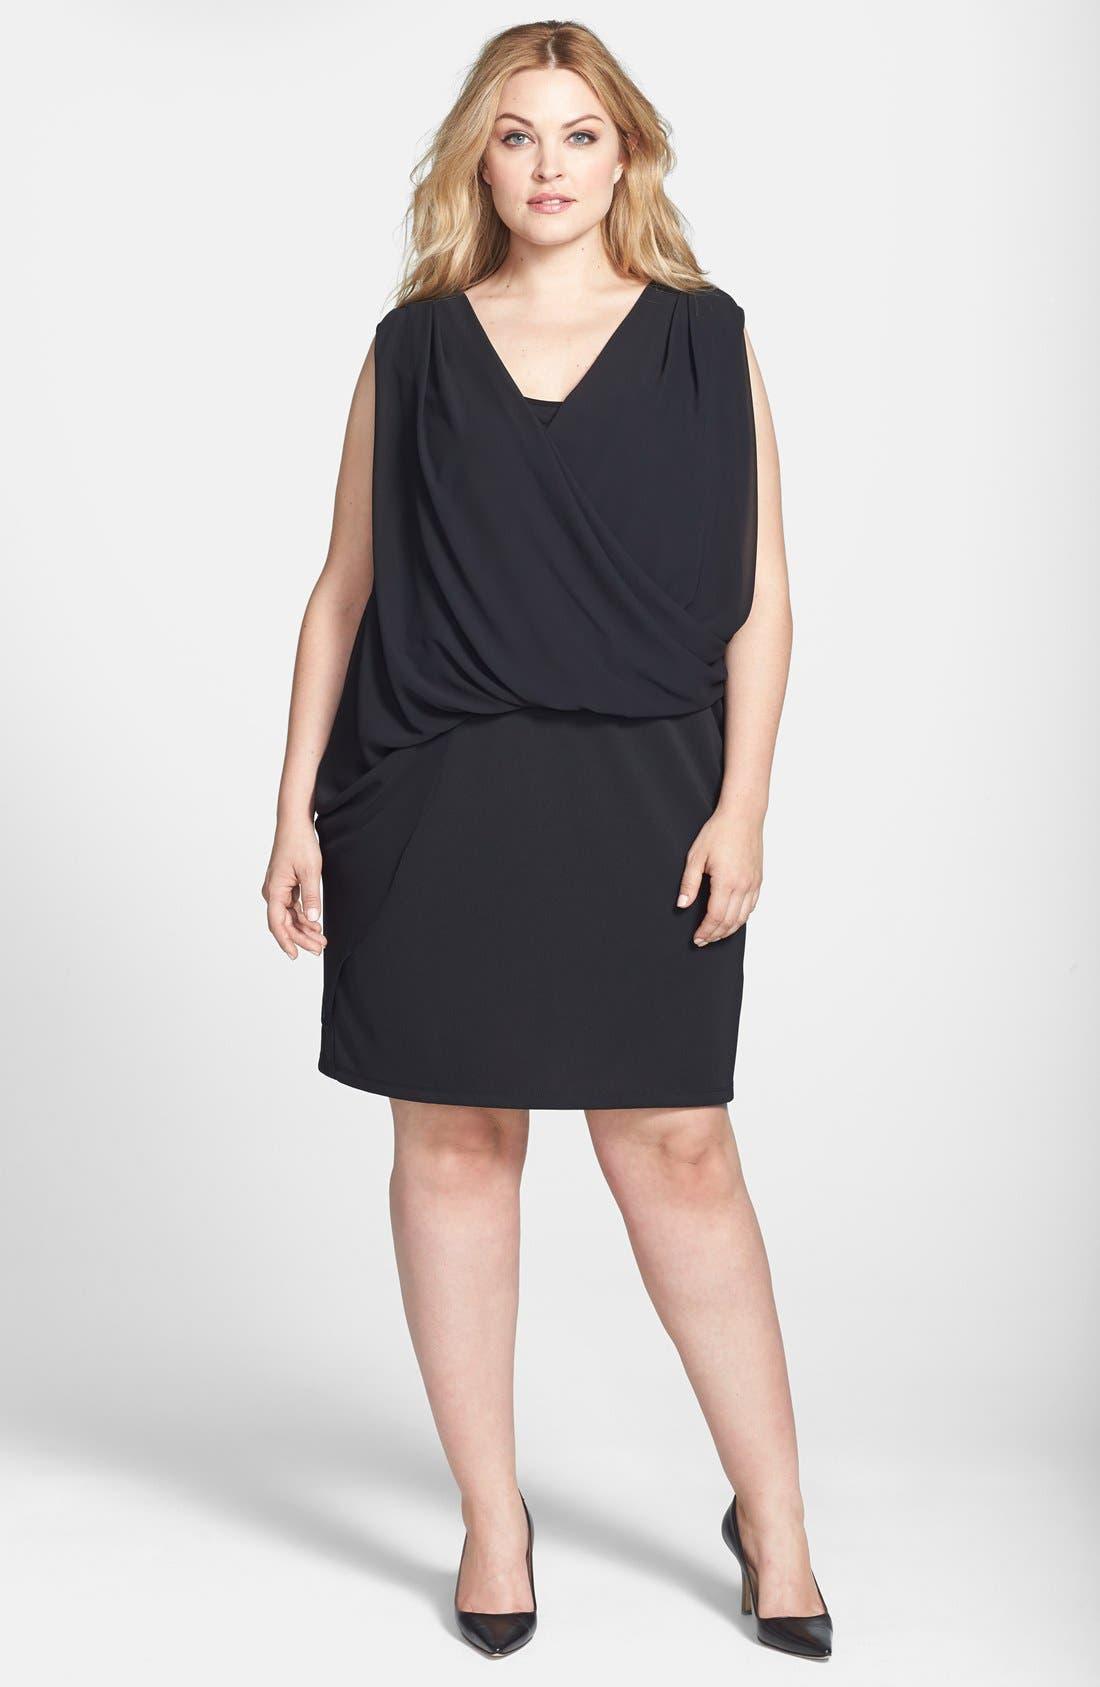 Alternate Image 1 Selected - DKNYC Chiffon Overlay Dress (Plus Size)